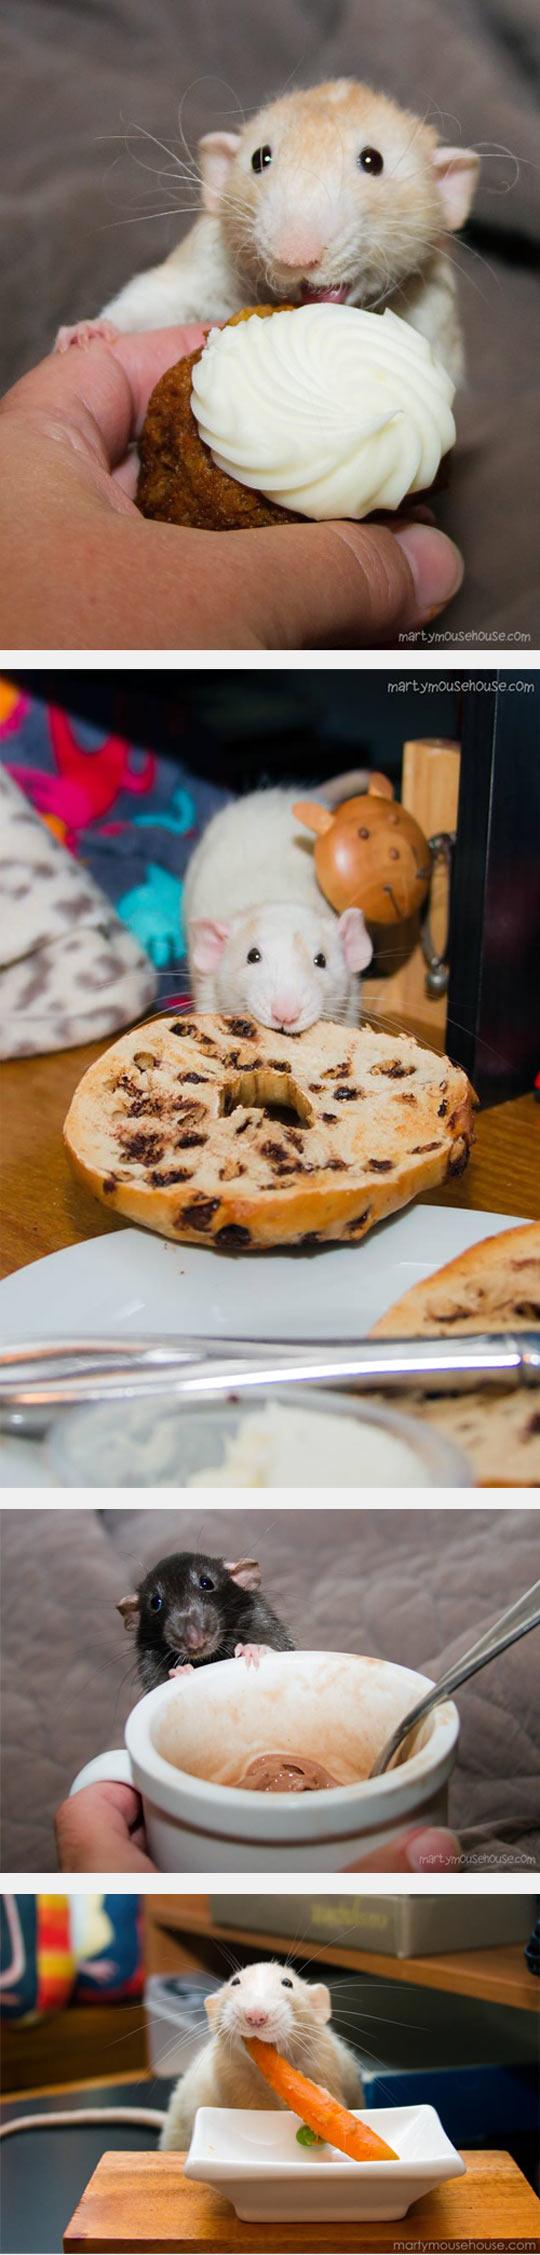 Rats' Favorite Dessert